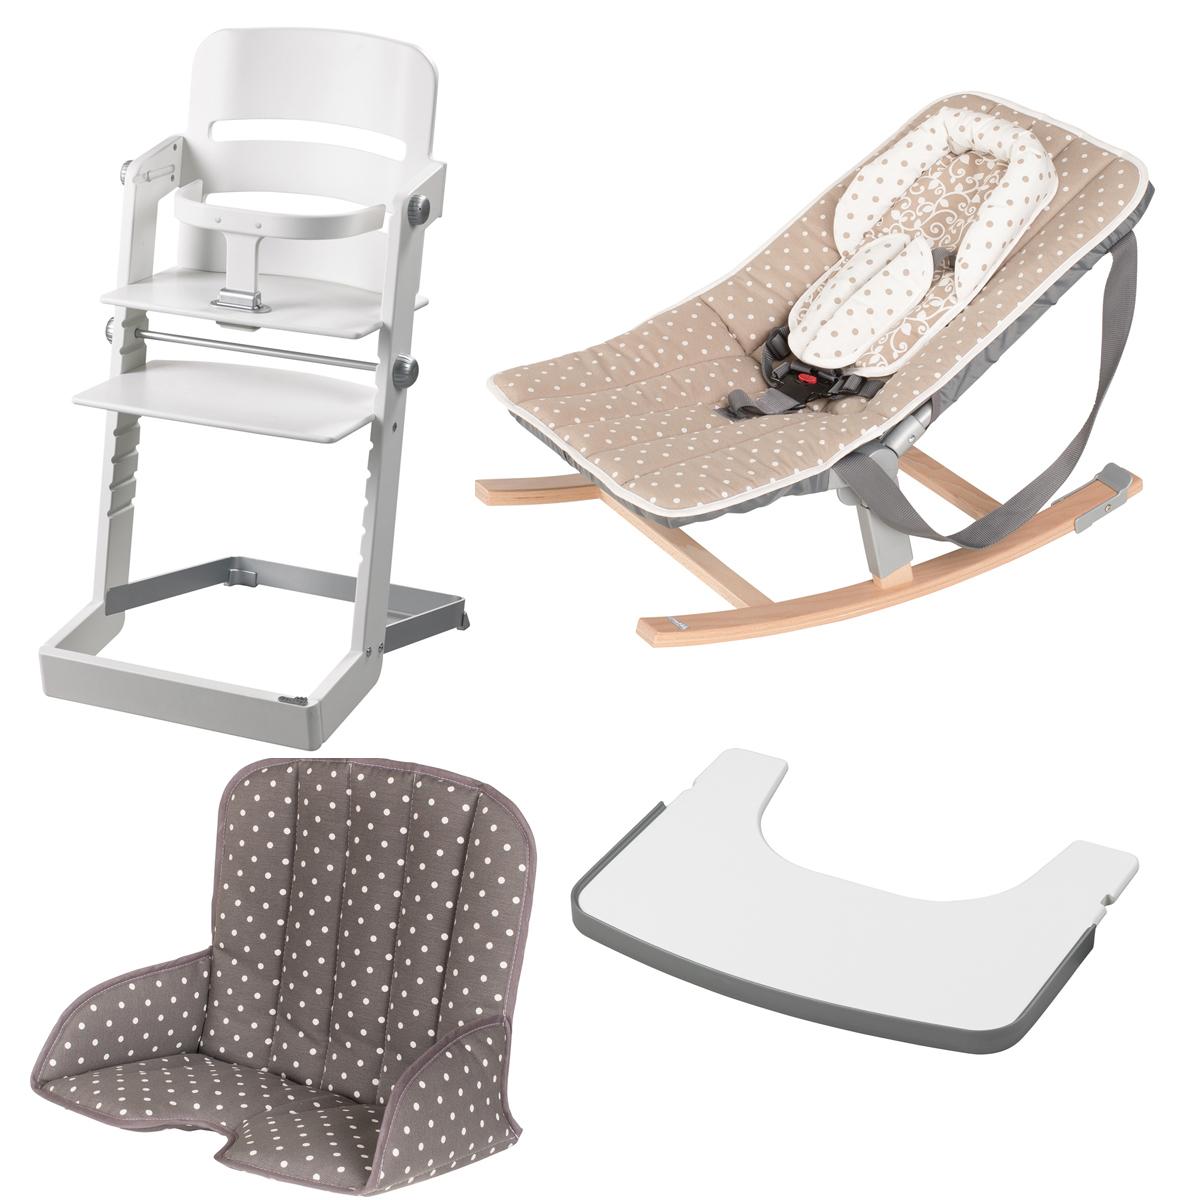 geuther pack chaise haute tamino transat rocco tablette coussin de chaise blanc. Black Bedroom Furniture Sets. Home Design Ideas